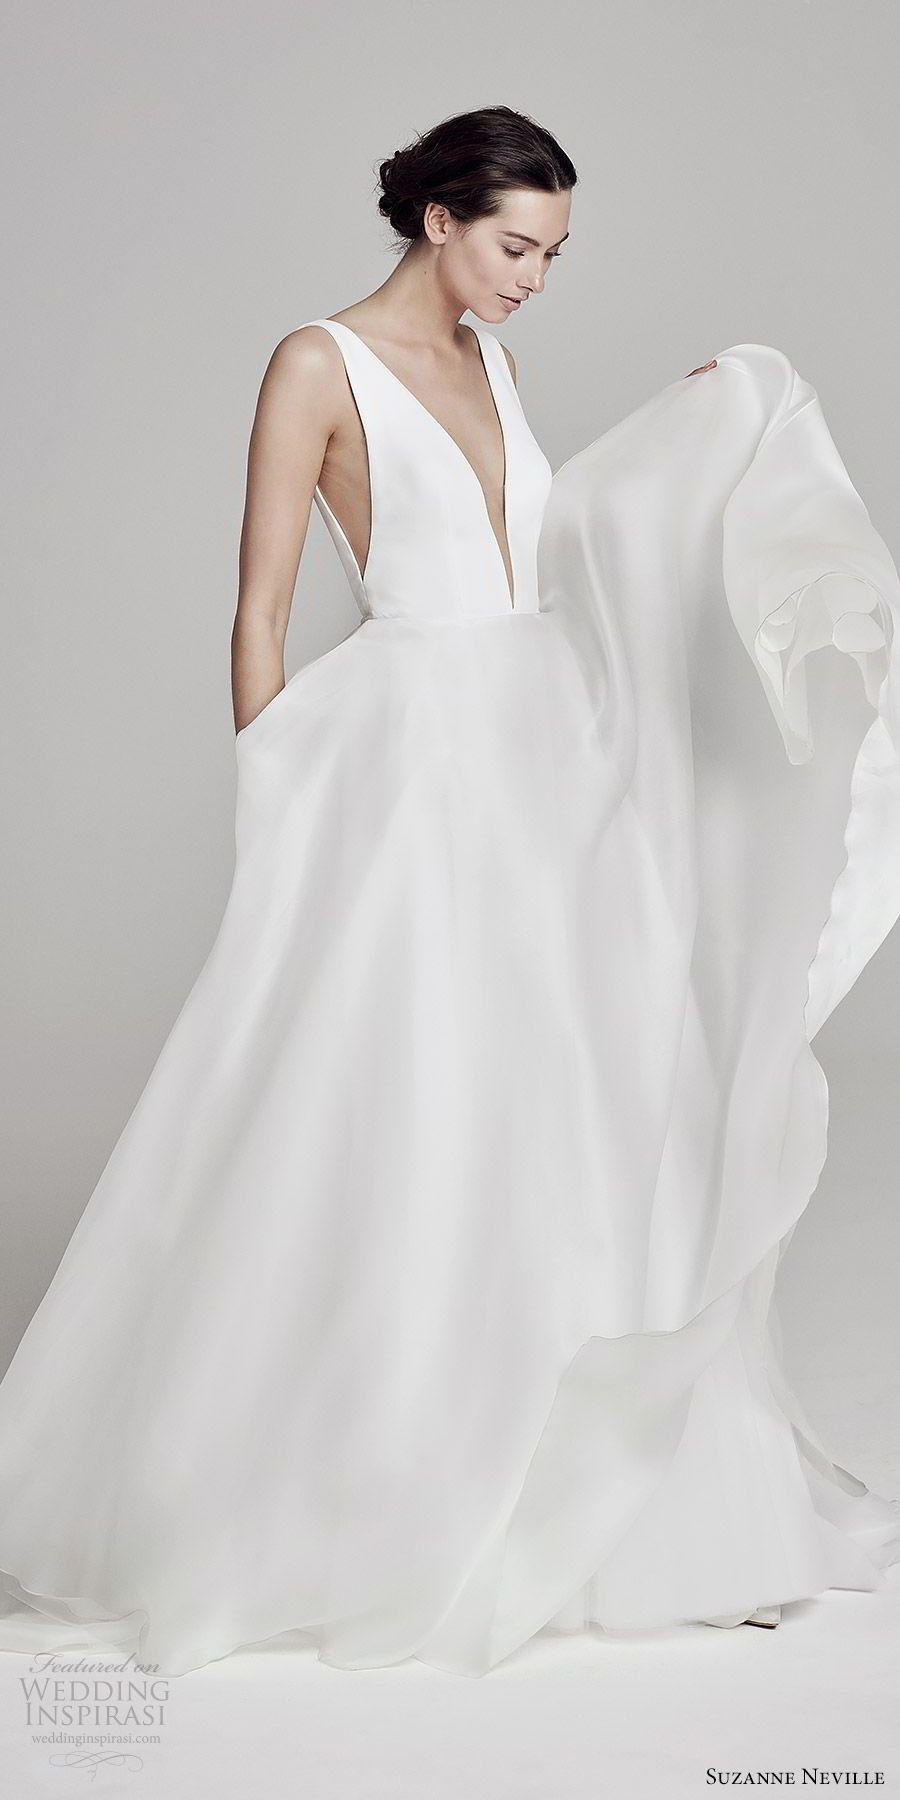 375ad4c7b8a9 suzanne neville bridal 2019 sleeveless plunging v neck a line wedding dress  (serrano) clean chic modern minimal mv -- Suzanne Neville 2019 Wedding  Dresses ...